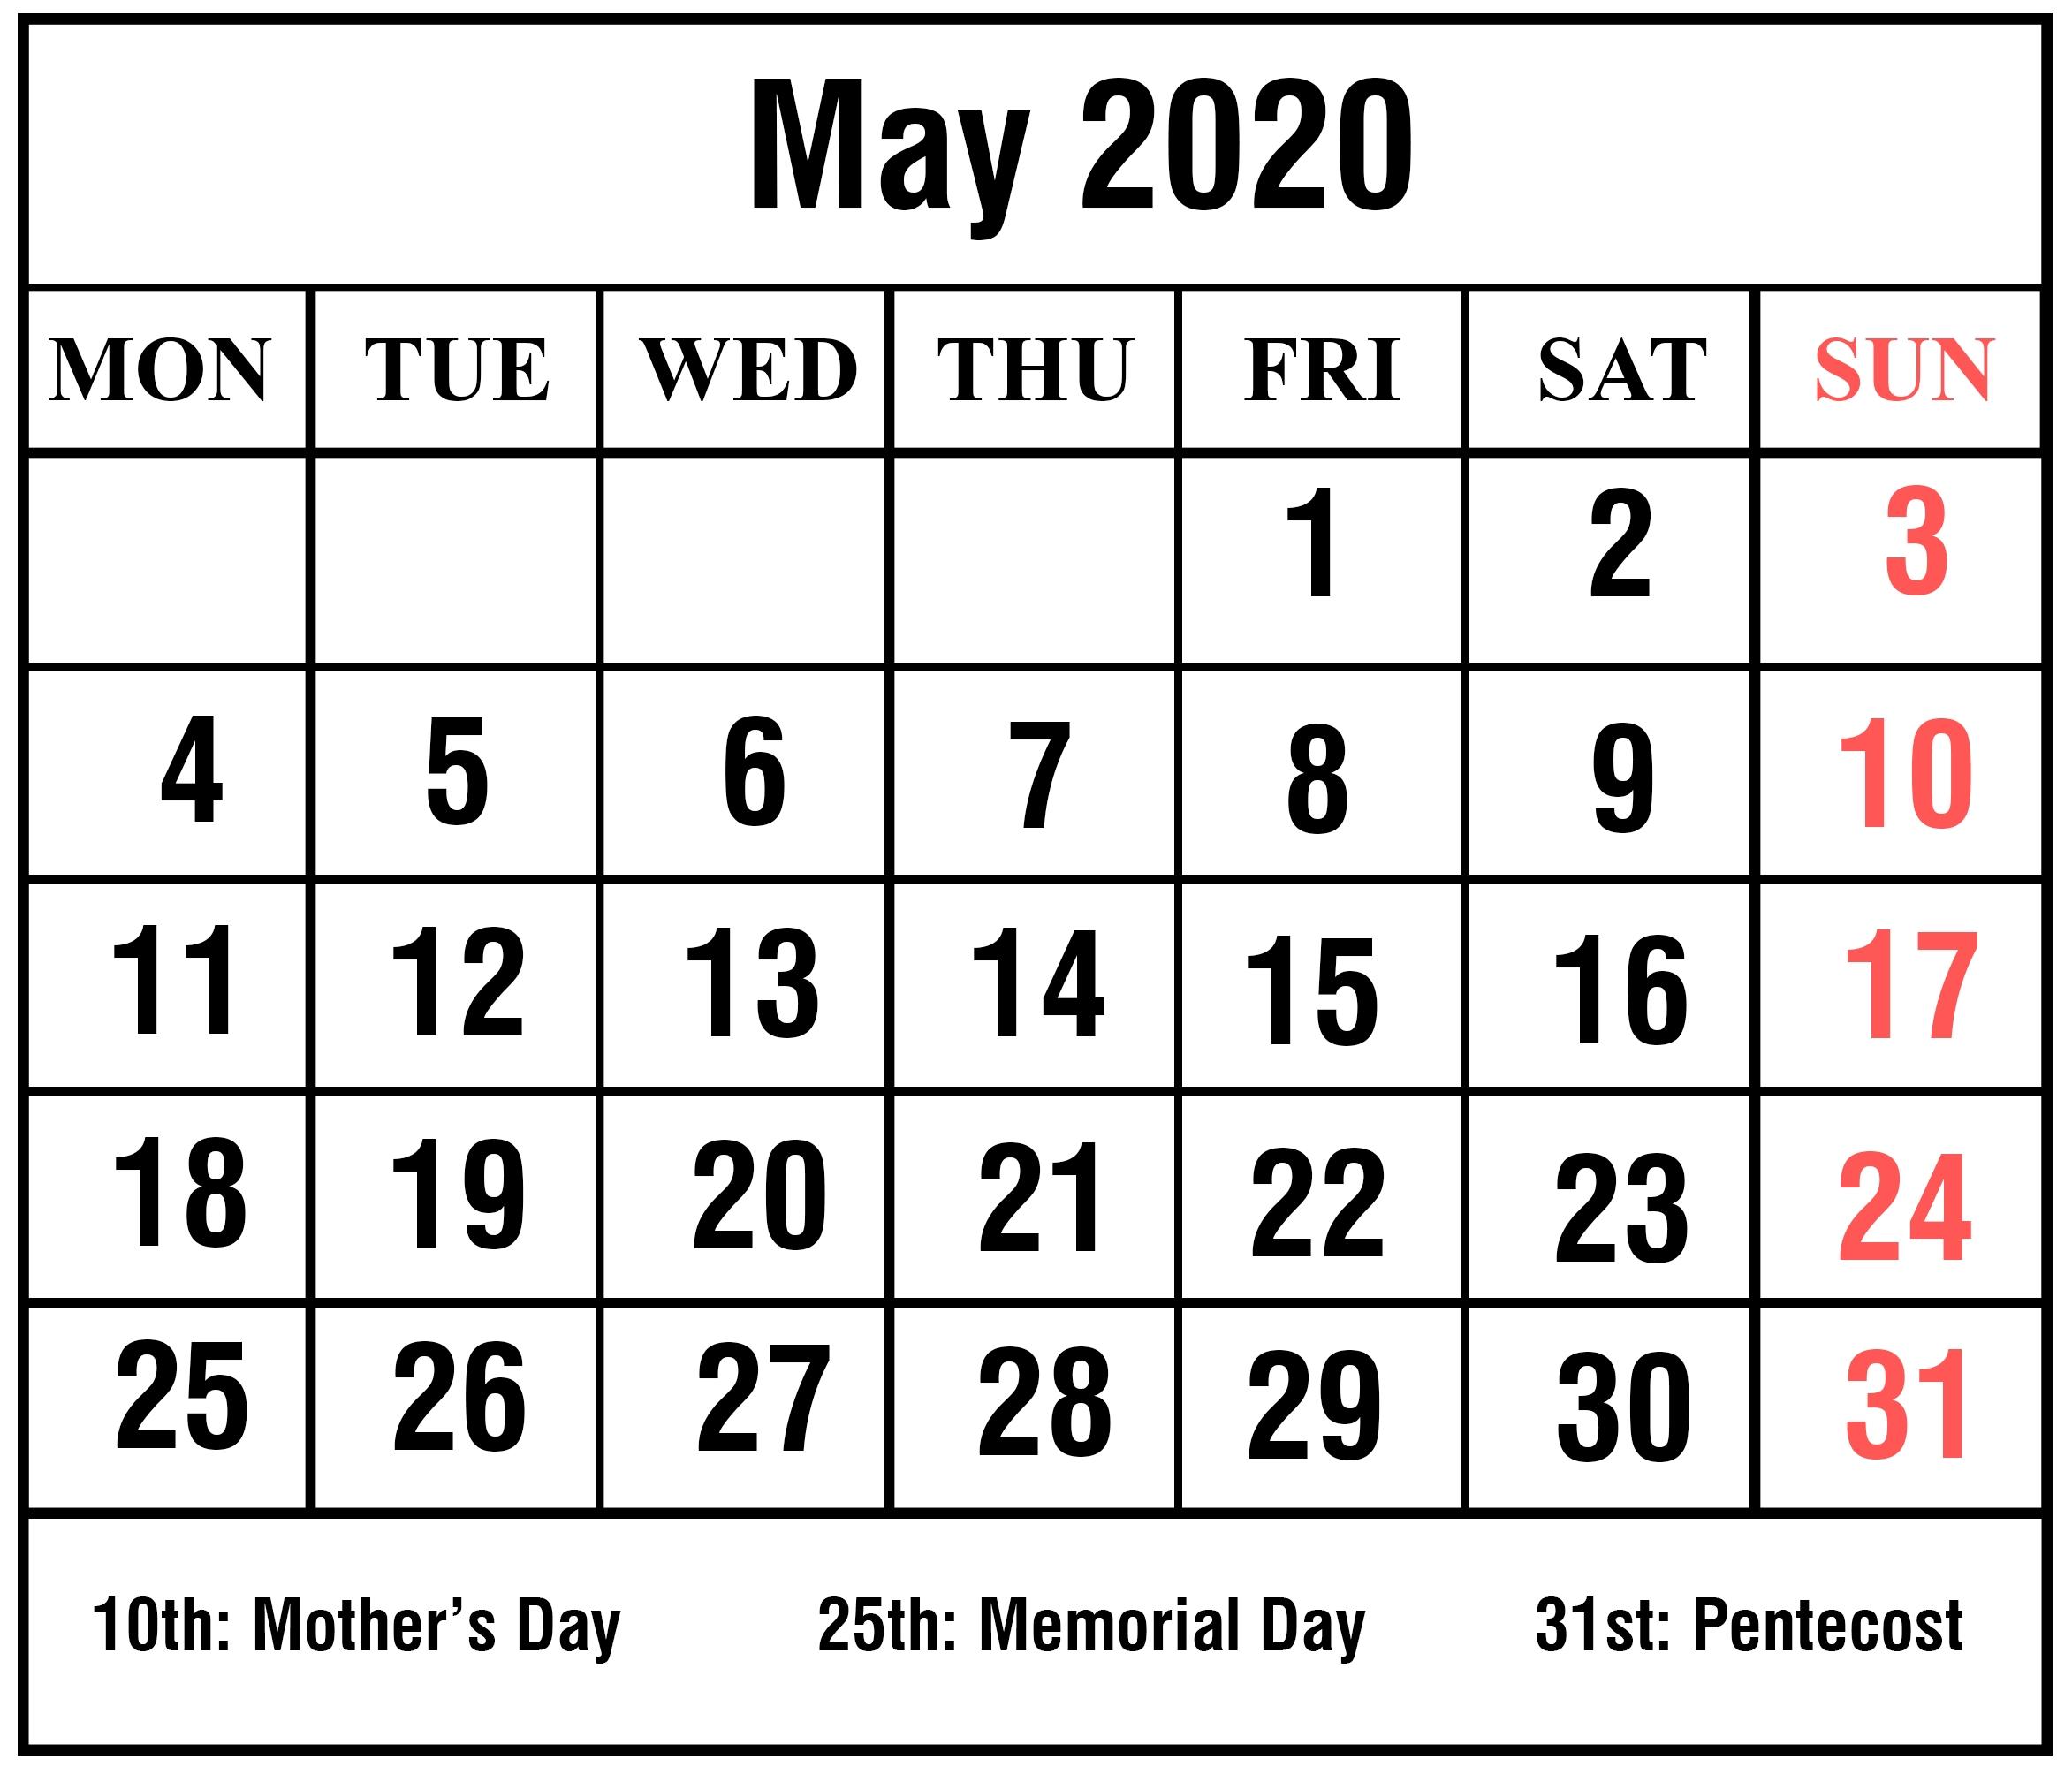 Free Printable May 2020 Calendar Templates [Pdf,word,excel